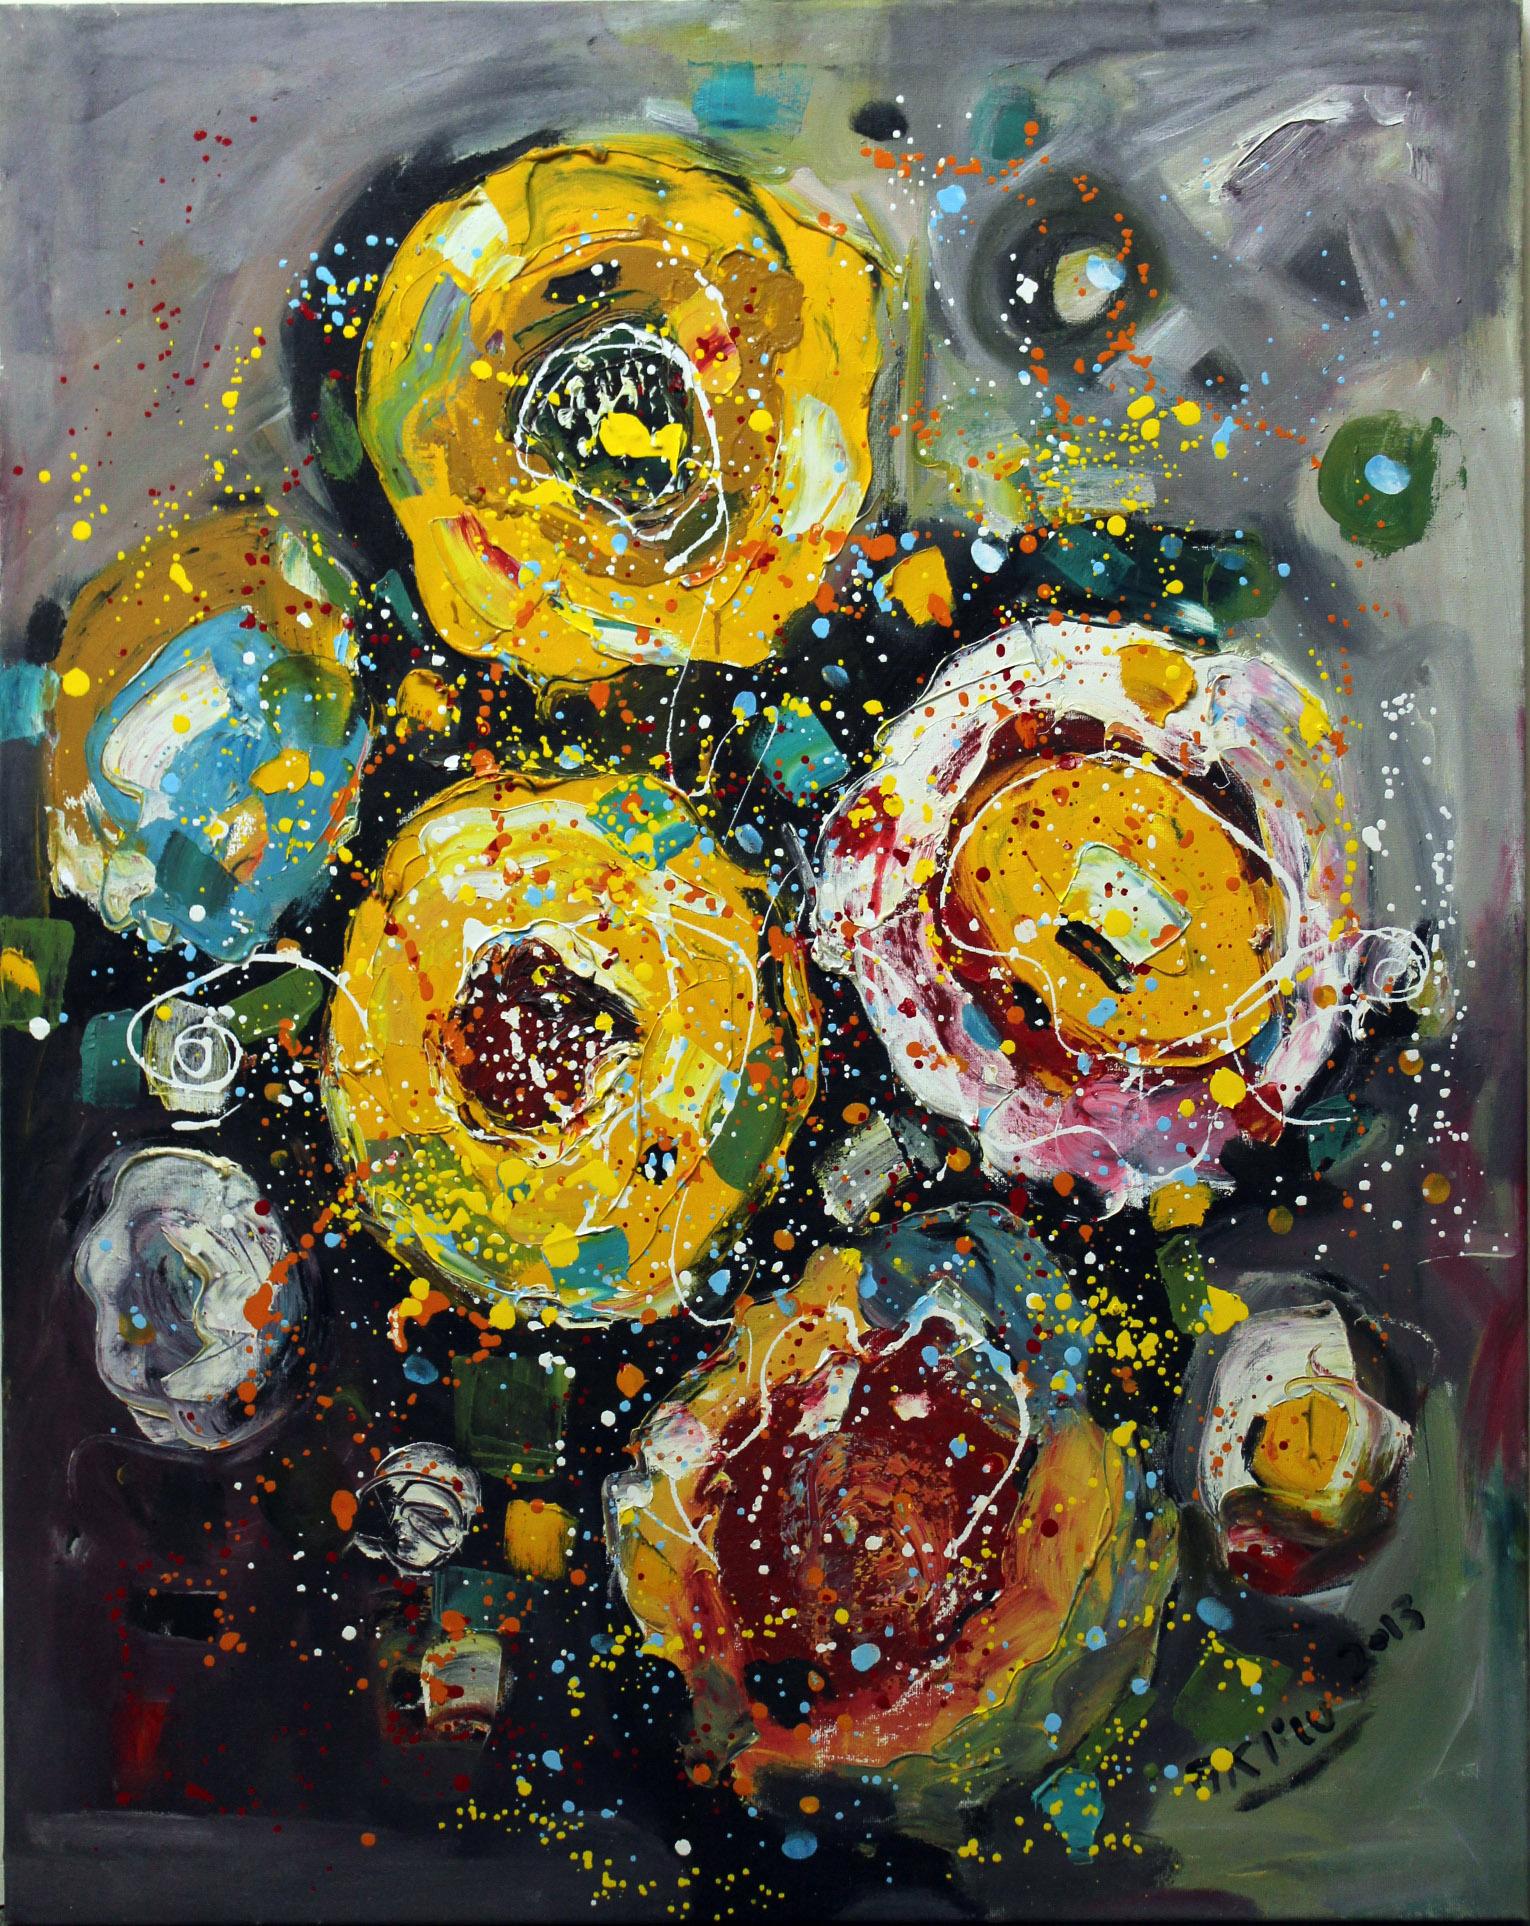 Flower artwork by Aklilu Temesgen - art listed for sale on Artplode